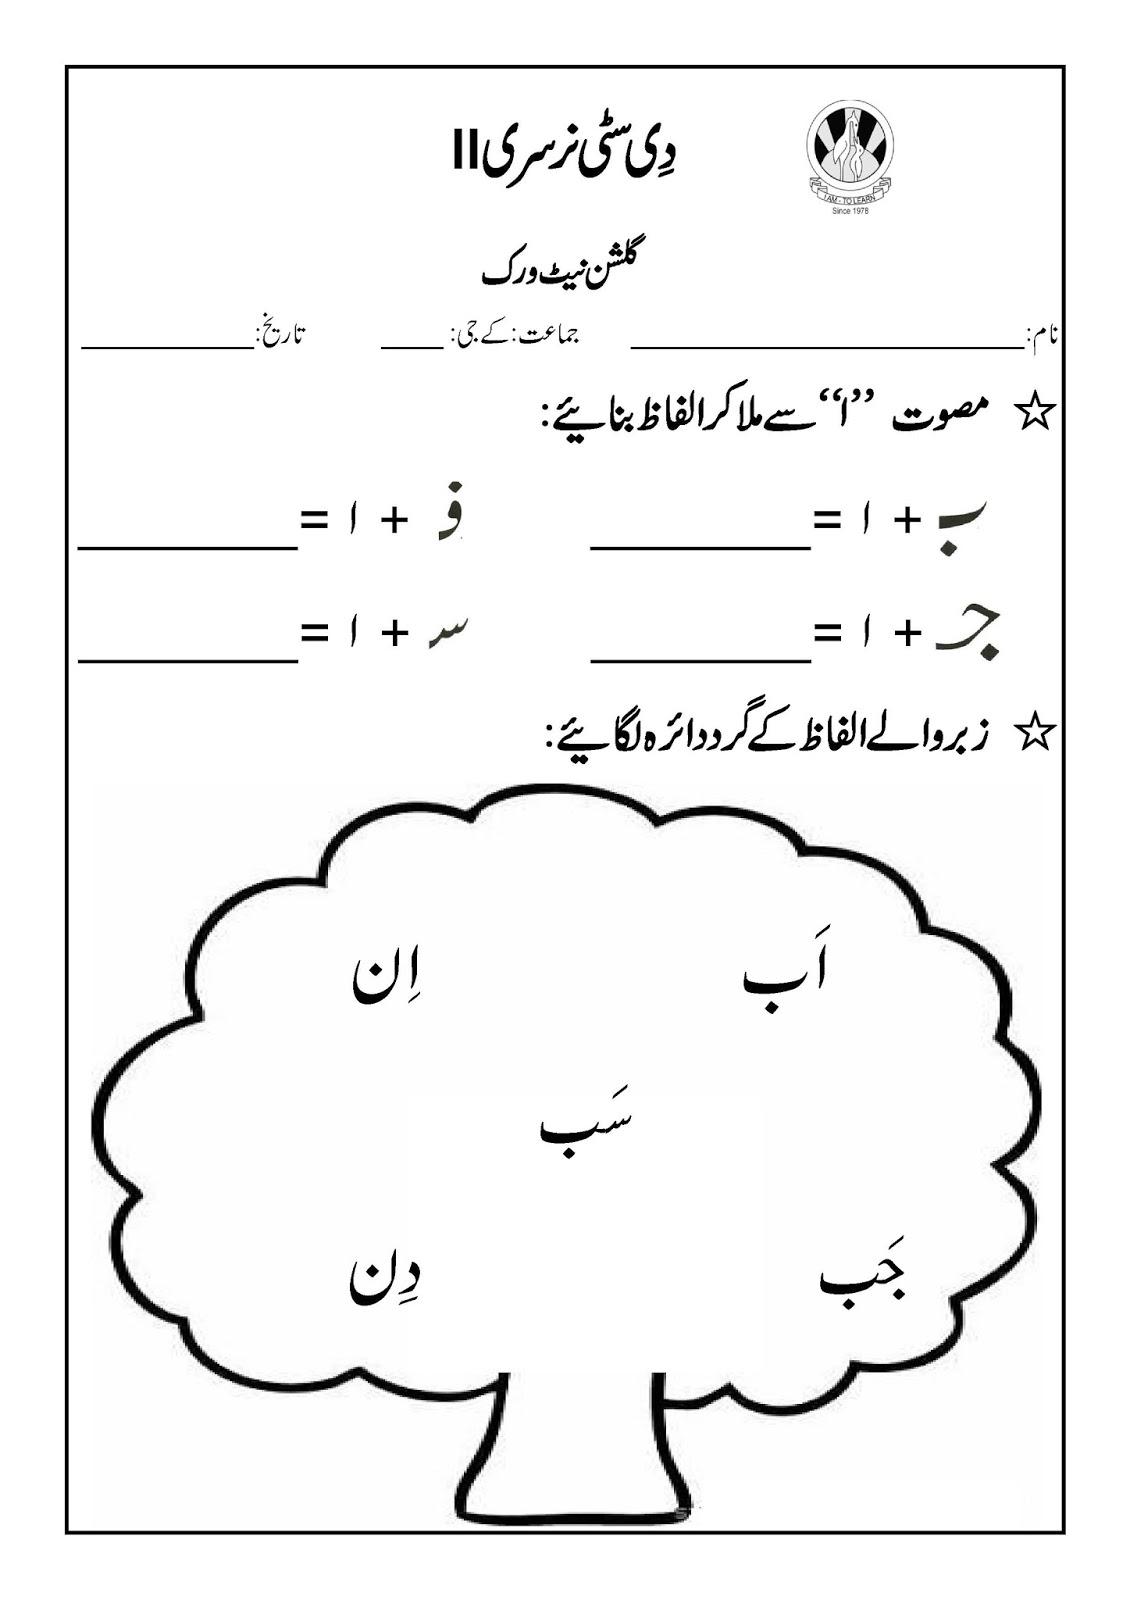 hight resolution of Tafheem Worksheets In Urdu   Printable Worksheets and Activities for  Teachers